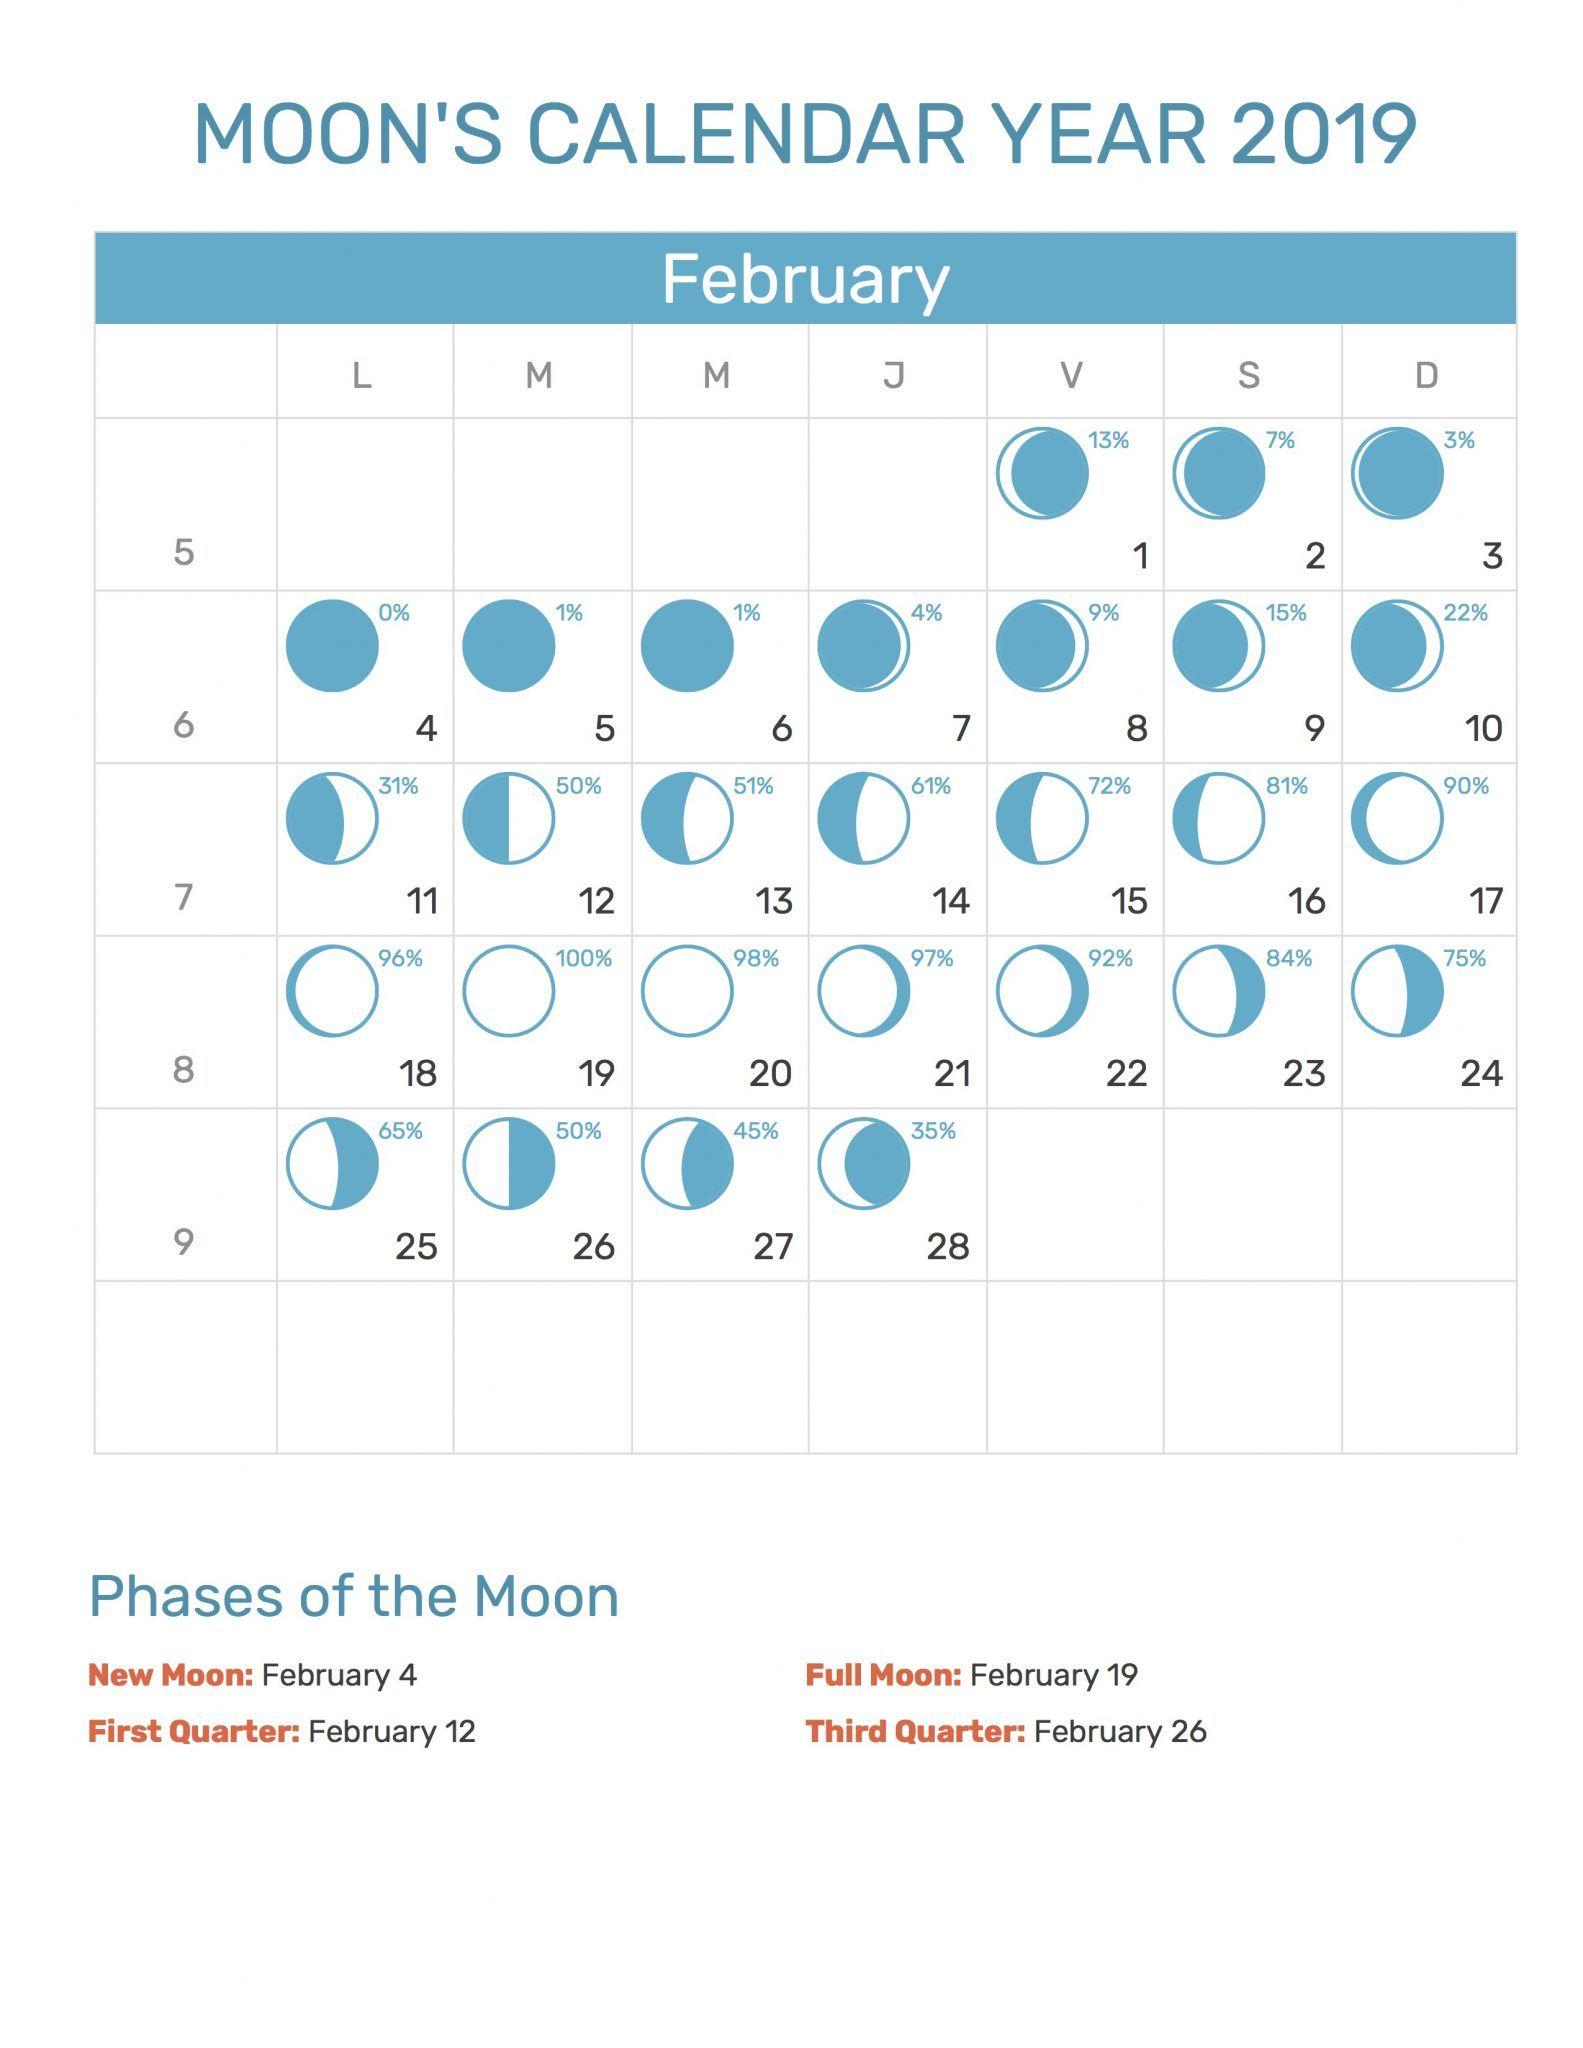 Moon Calendar Of February 2019 Moon Calendar February 2019 | 999+ Monthly Calendar Templates